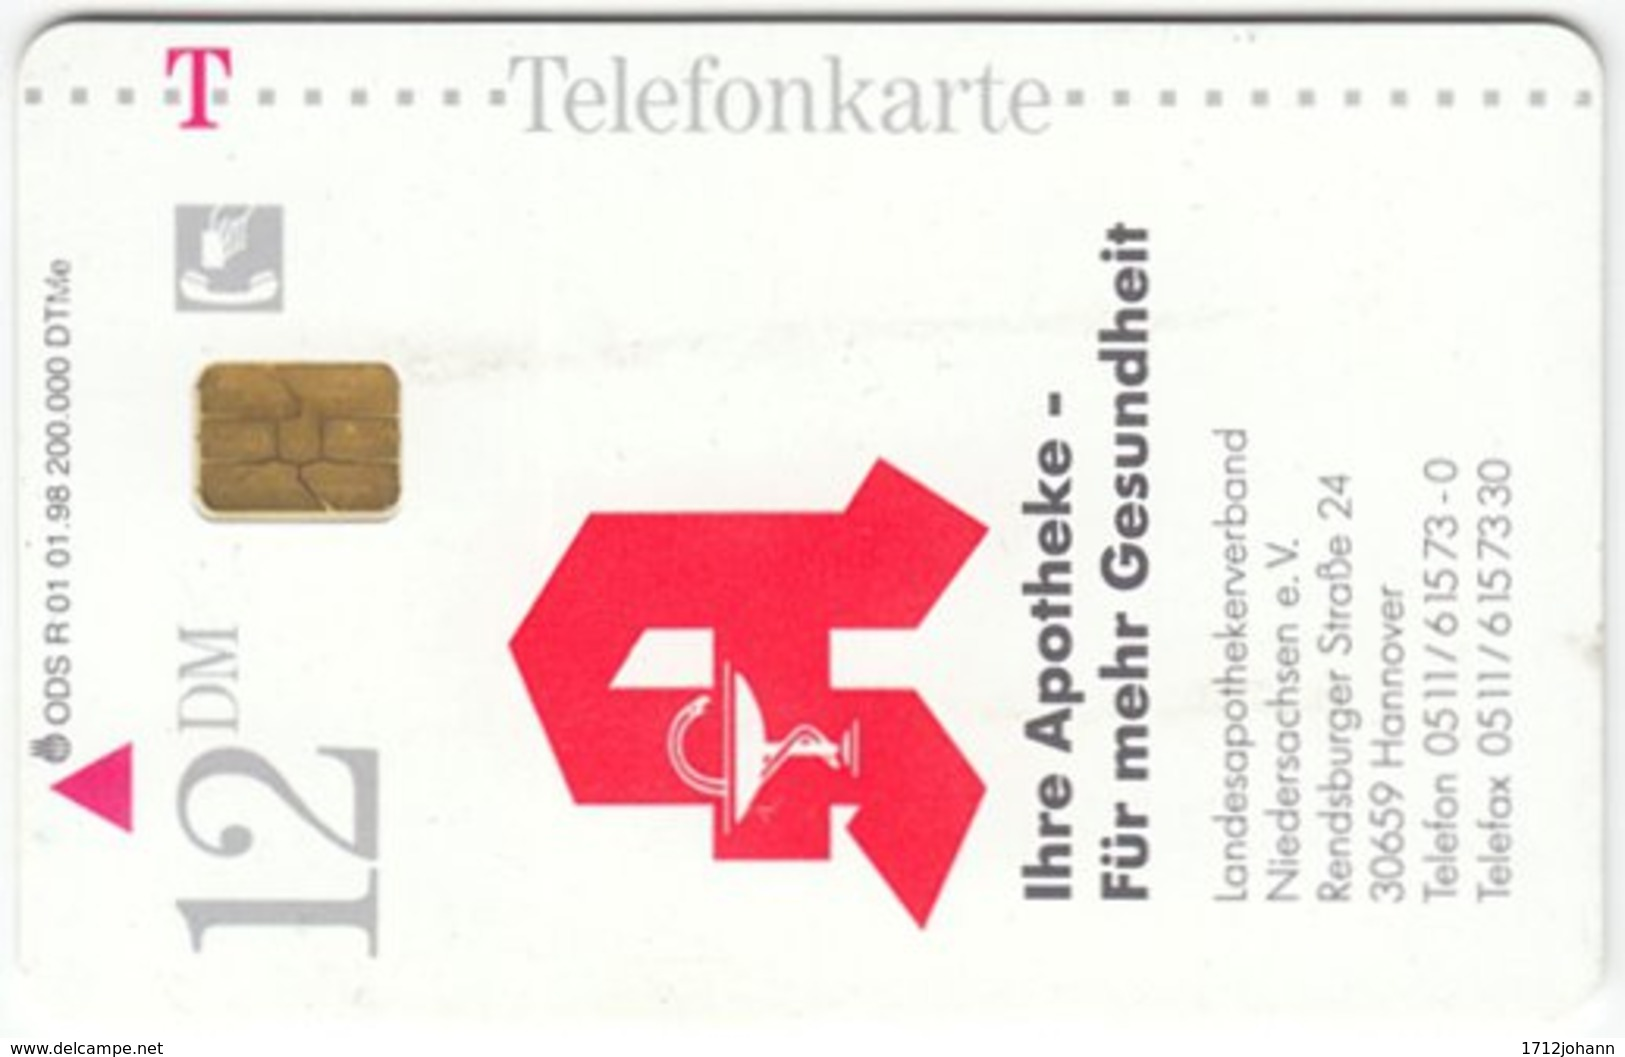 GERMANY R-Serie A-166 - 01 01.98 (2802) - Health, No Drugs - Used - R-Series: Regionale Schalterserie